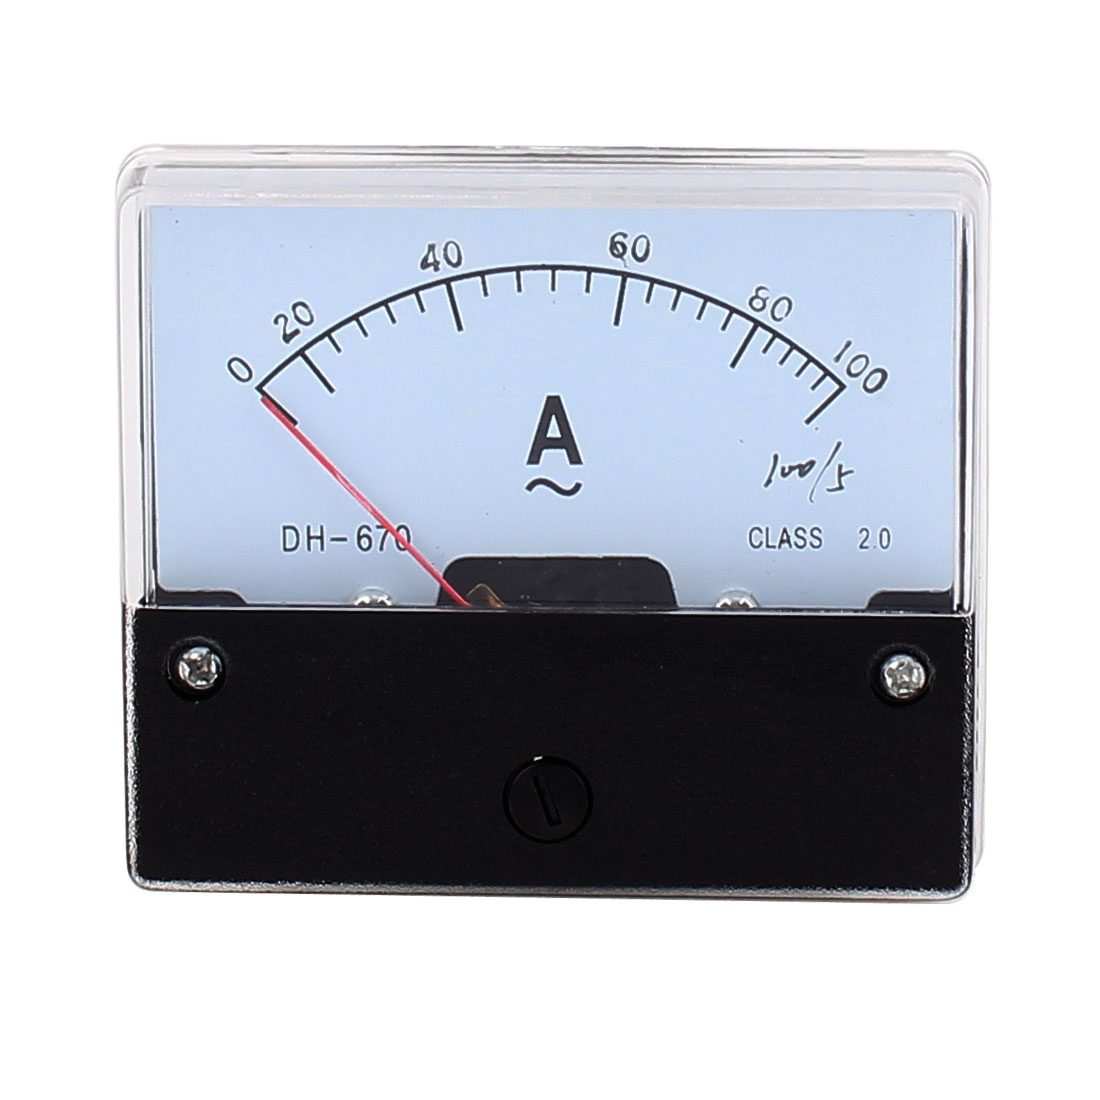 AC 0-100A Class 2.0 Analog Current Rectangle Panel Meter Ammeter Tester Gauge